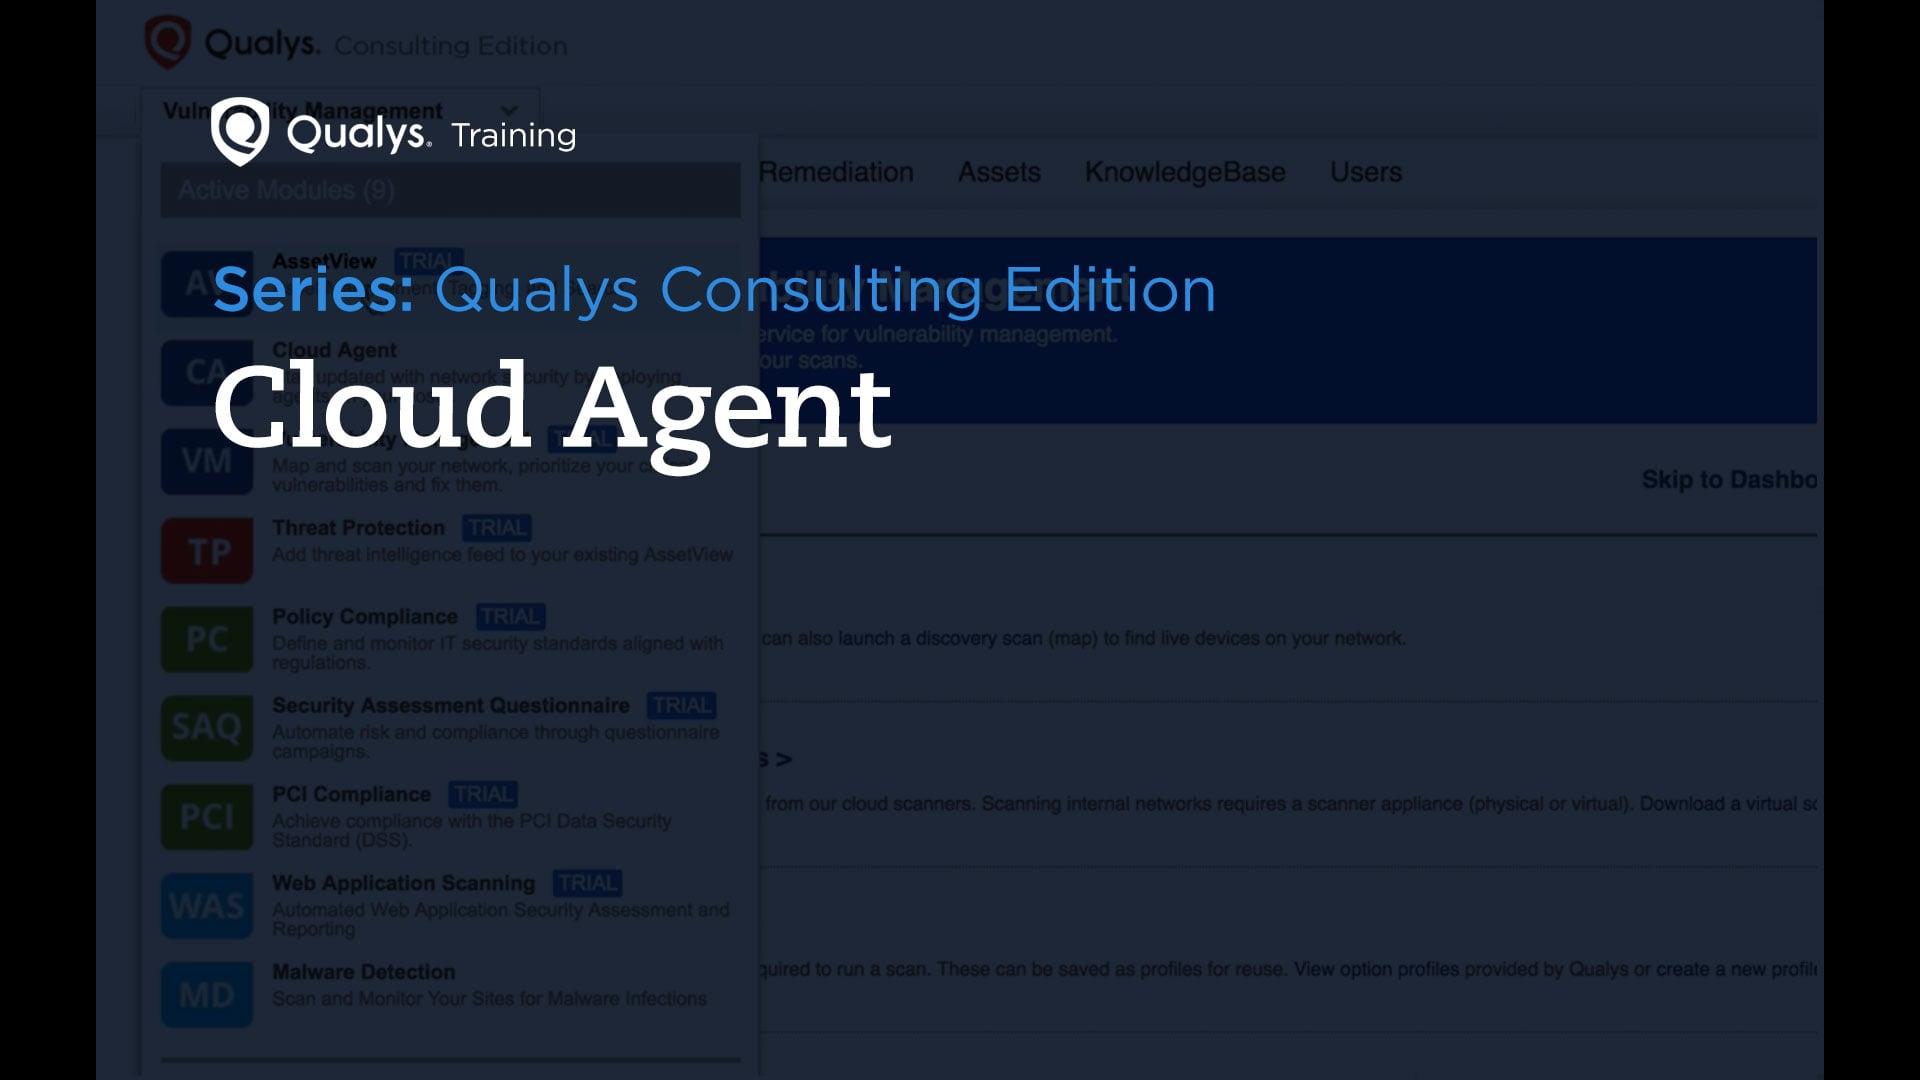 Cloud Agent - Qualys Consulting Edition